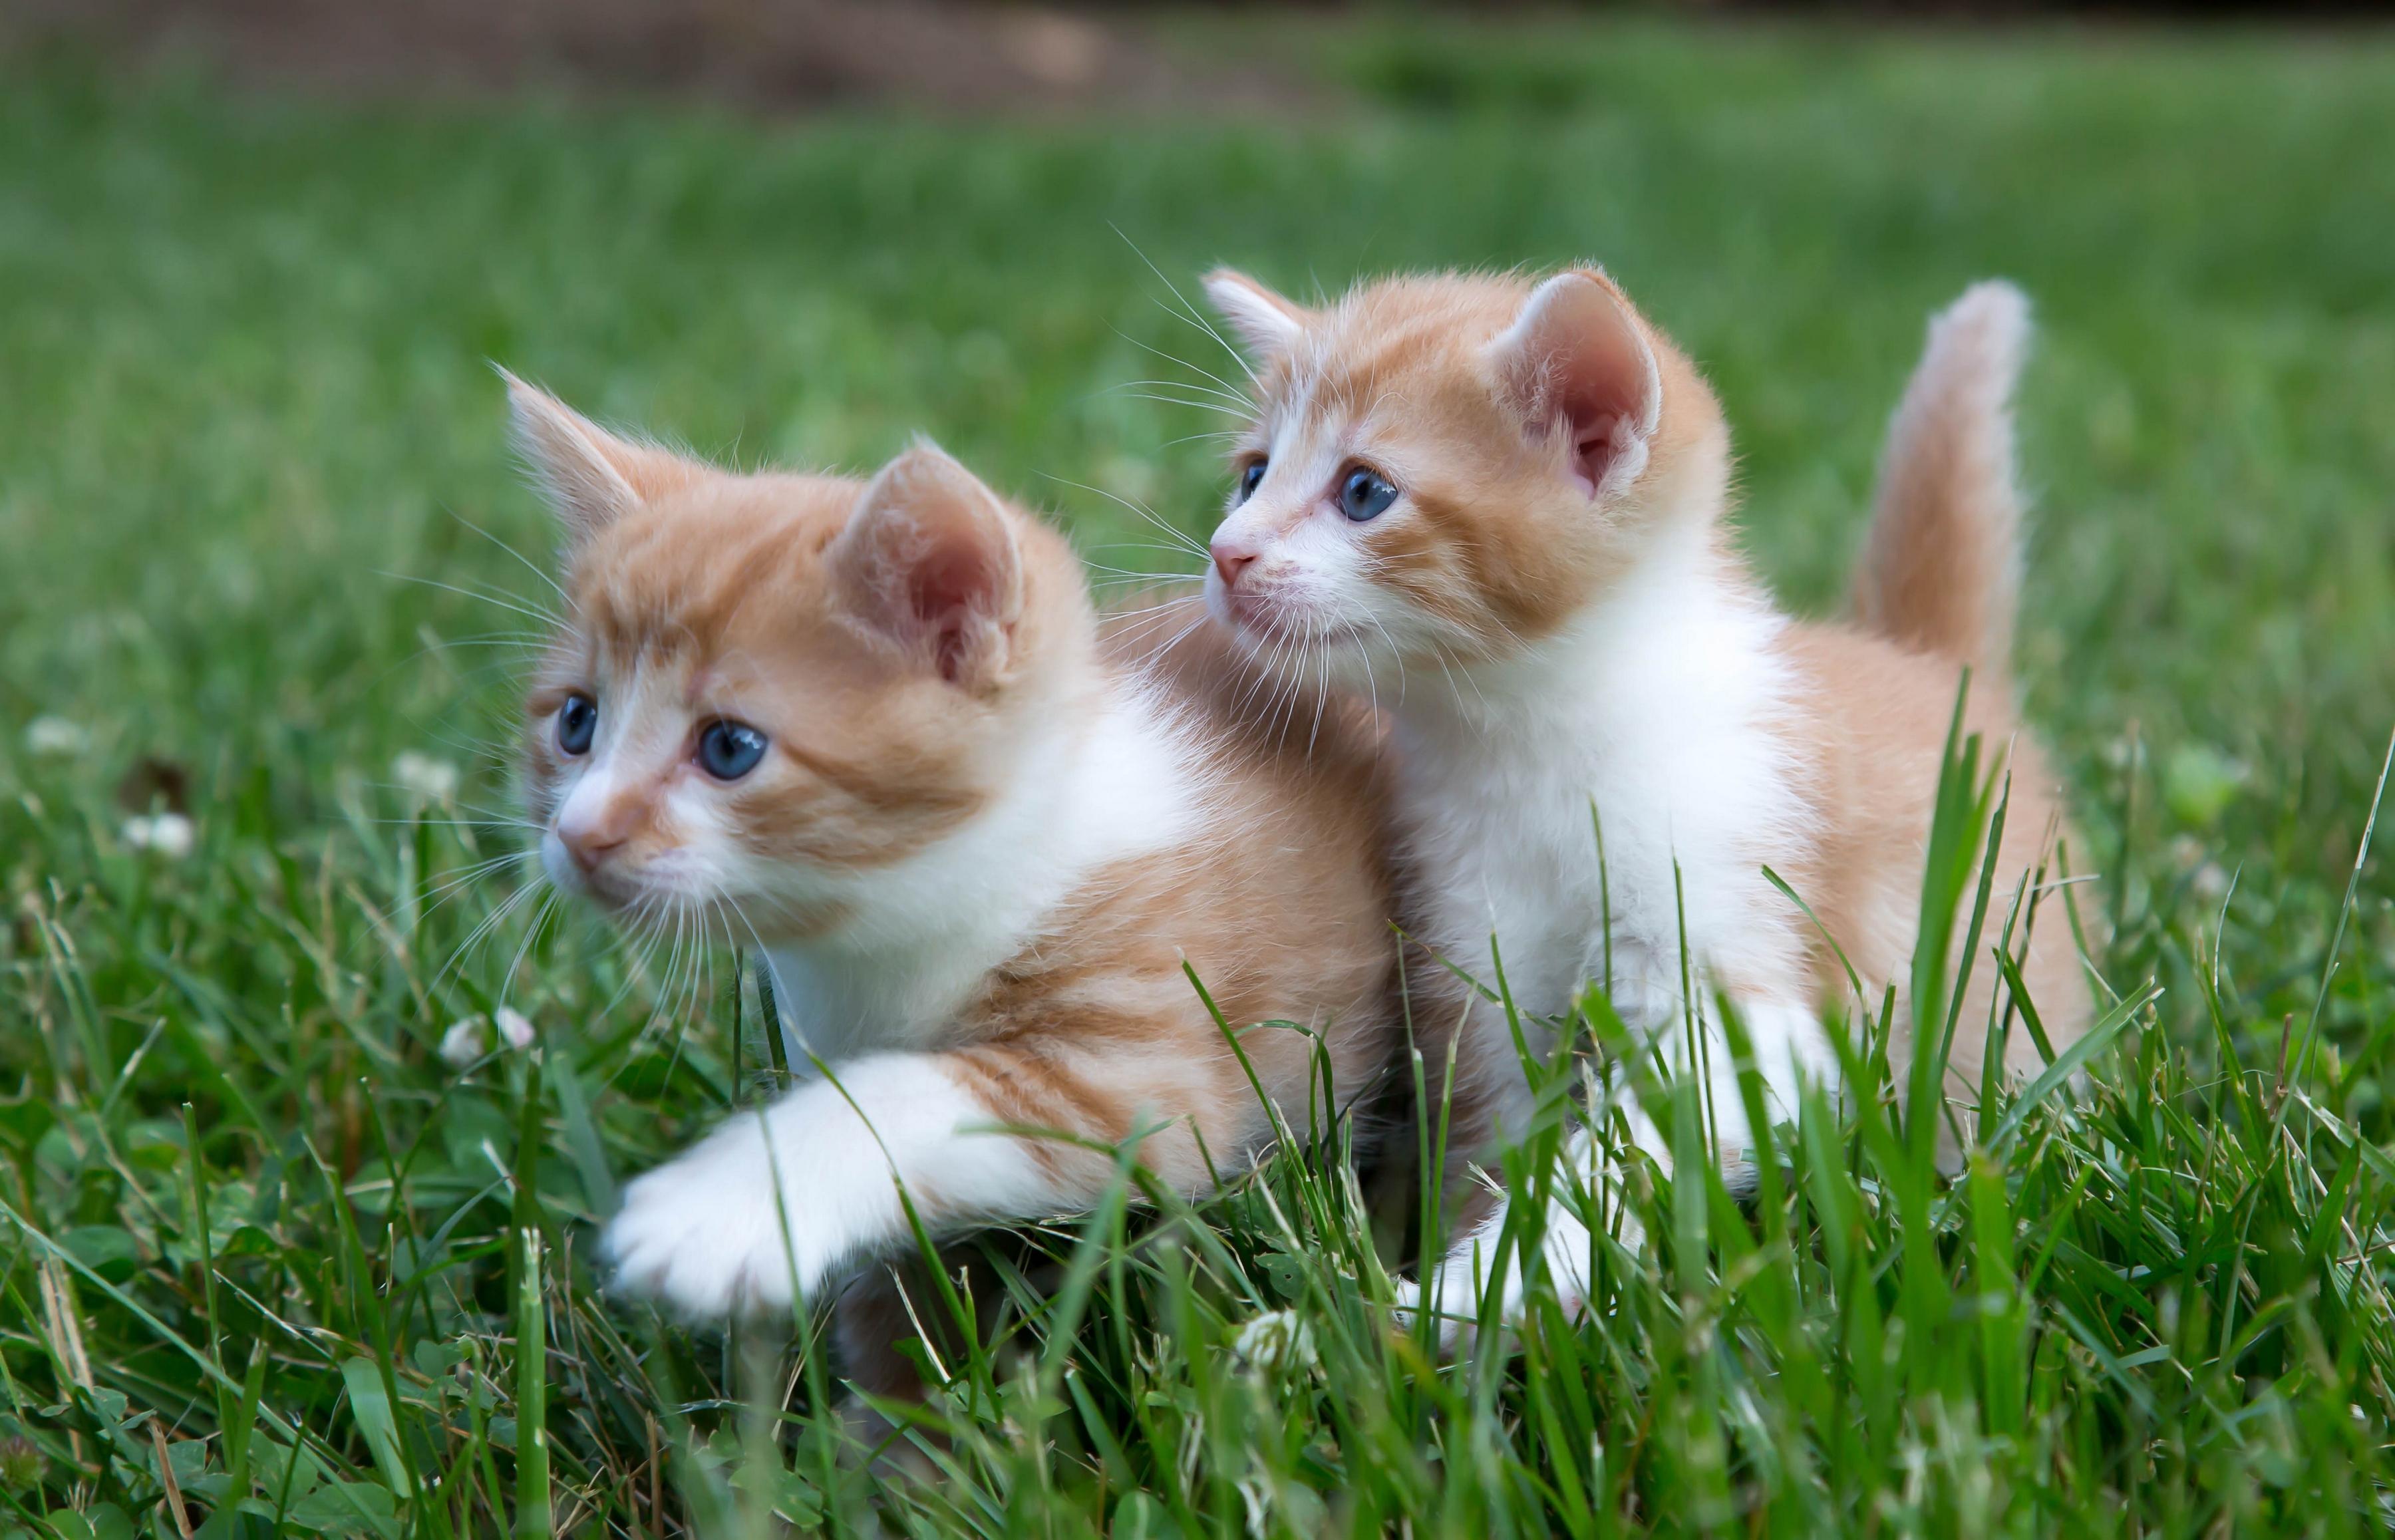 Котенок играющий с кошкой в траве  № 1994914 без смс